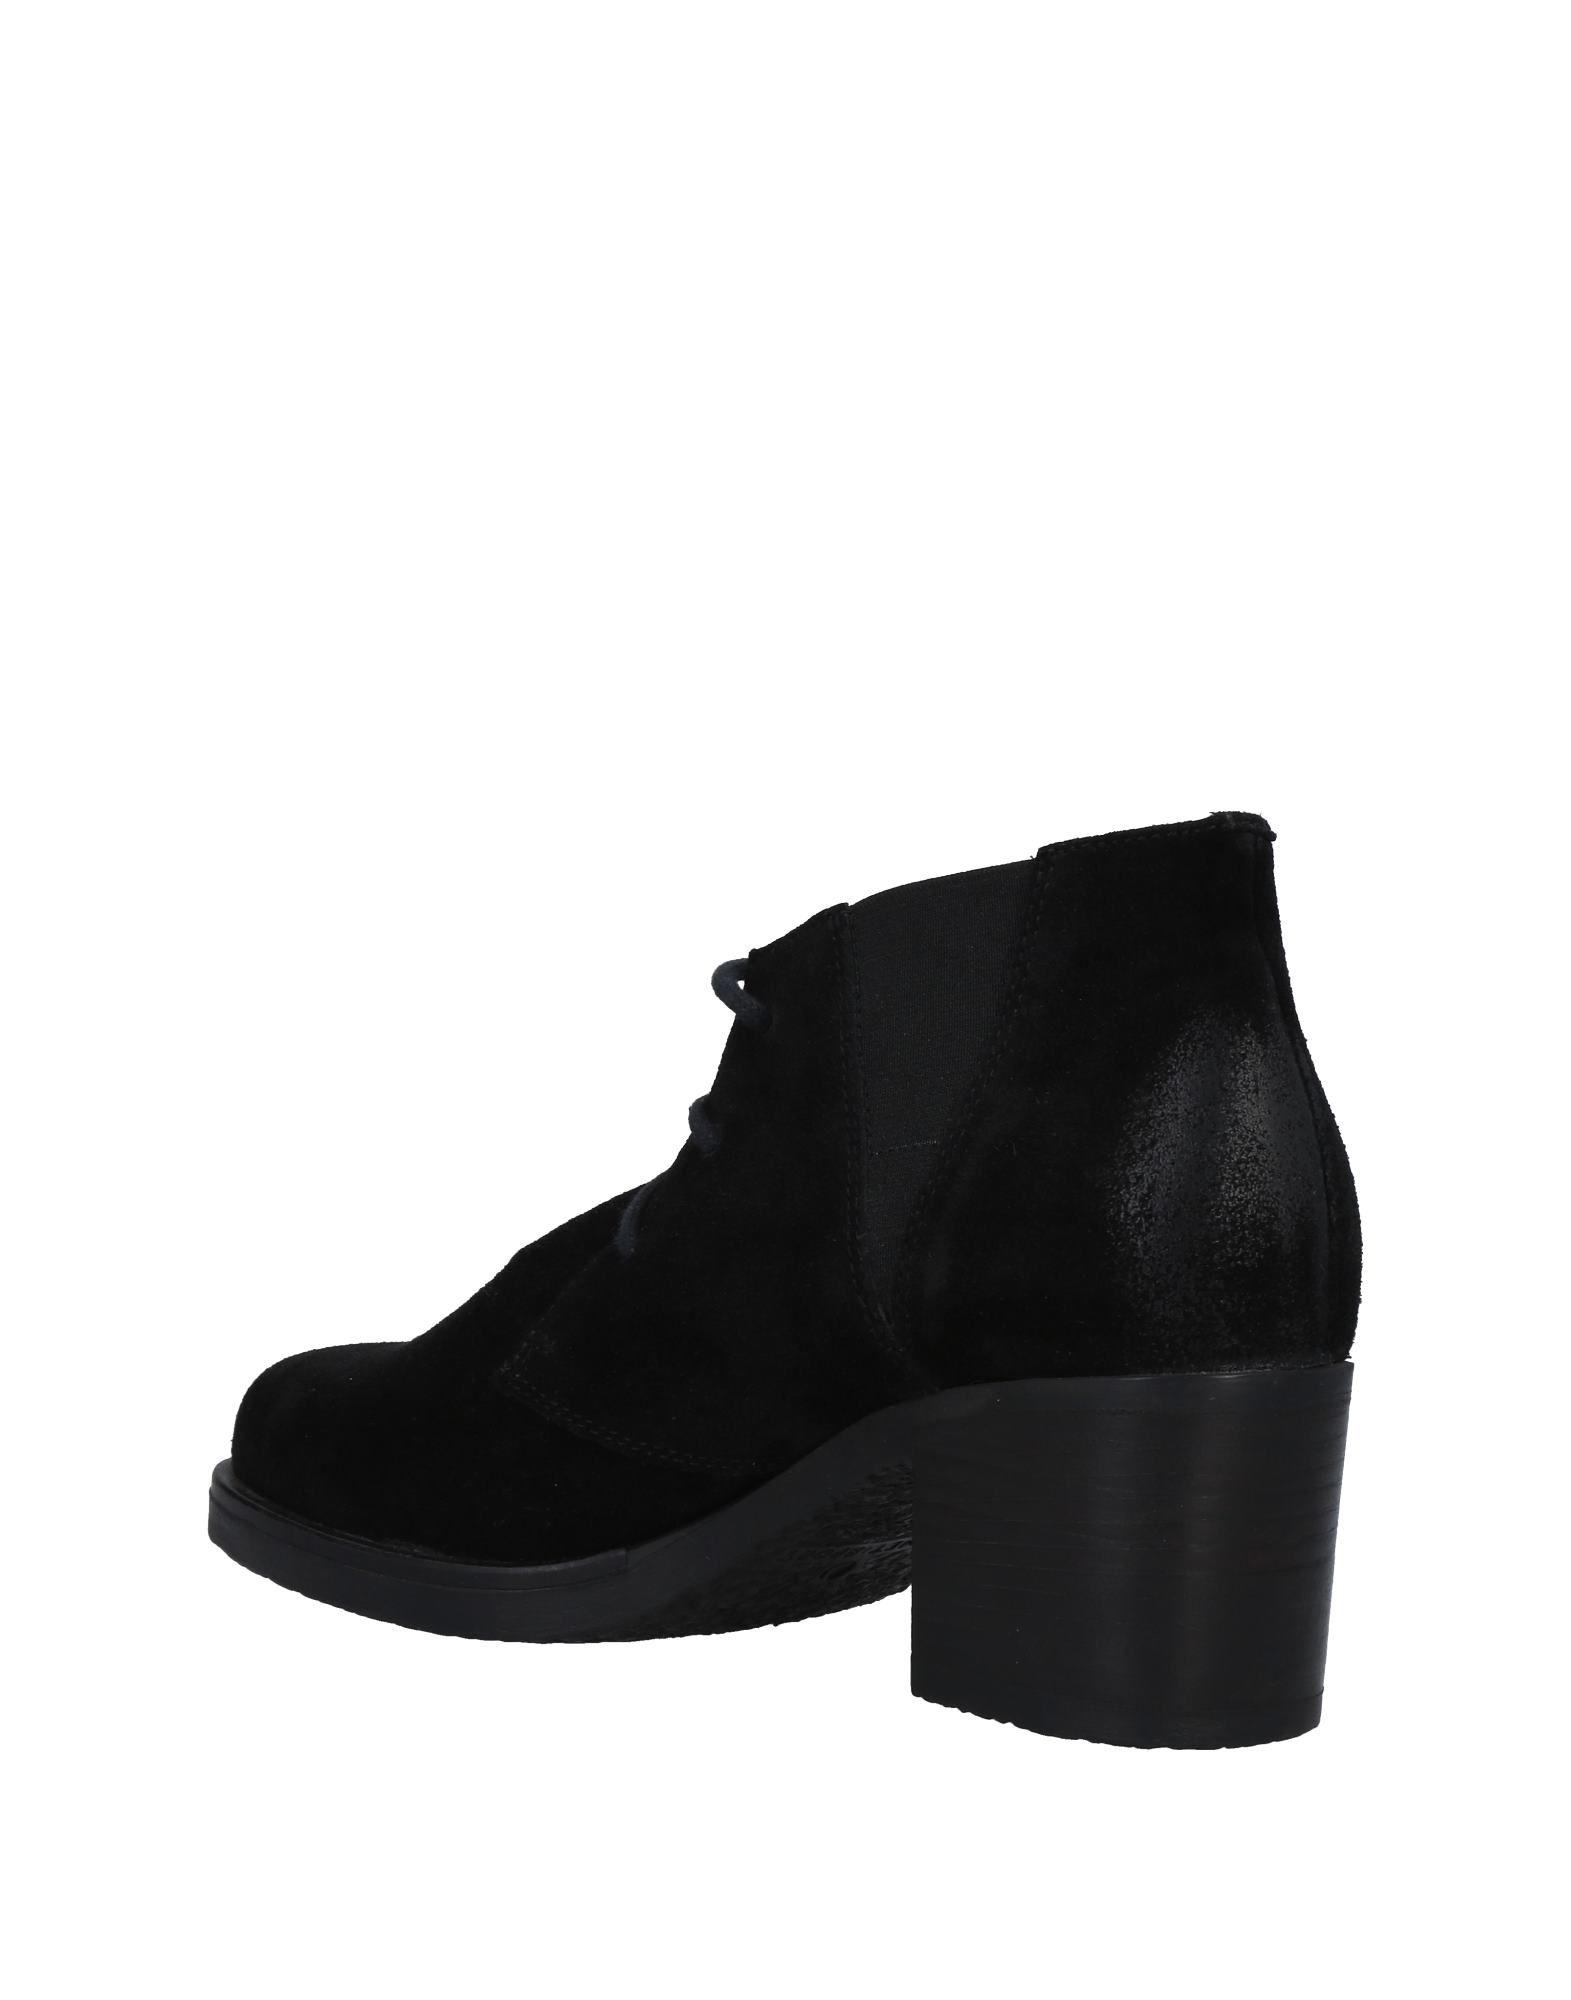 Janet Sport Schnürschuhe Damen  11480408VF Gute Qualität beliebte Schuhe